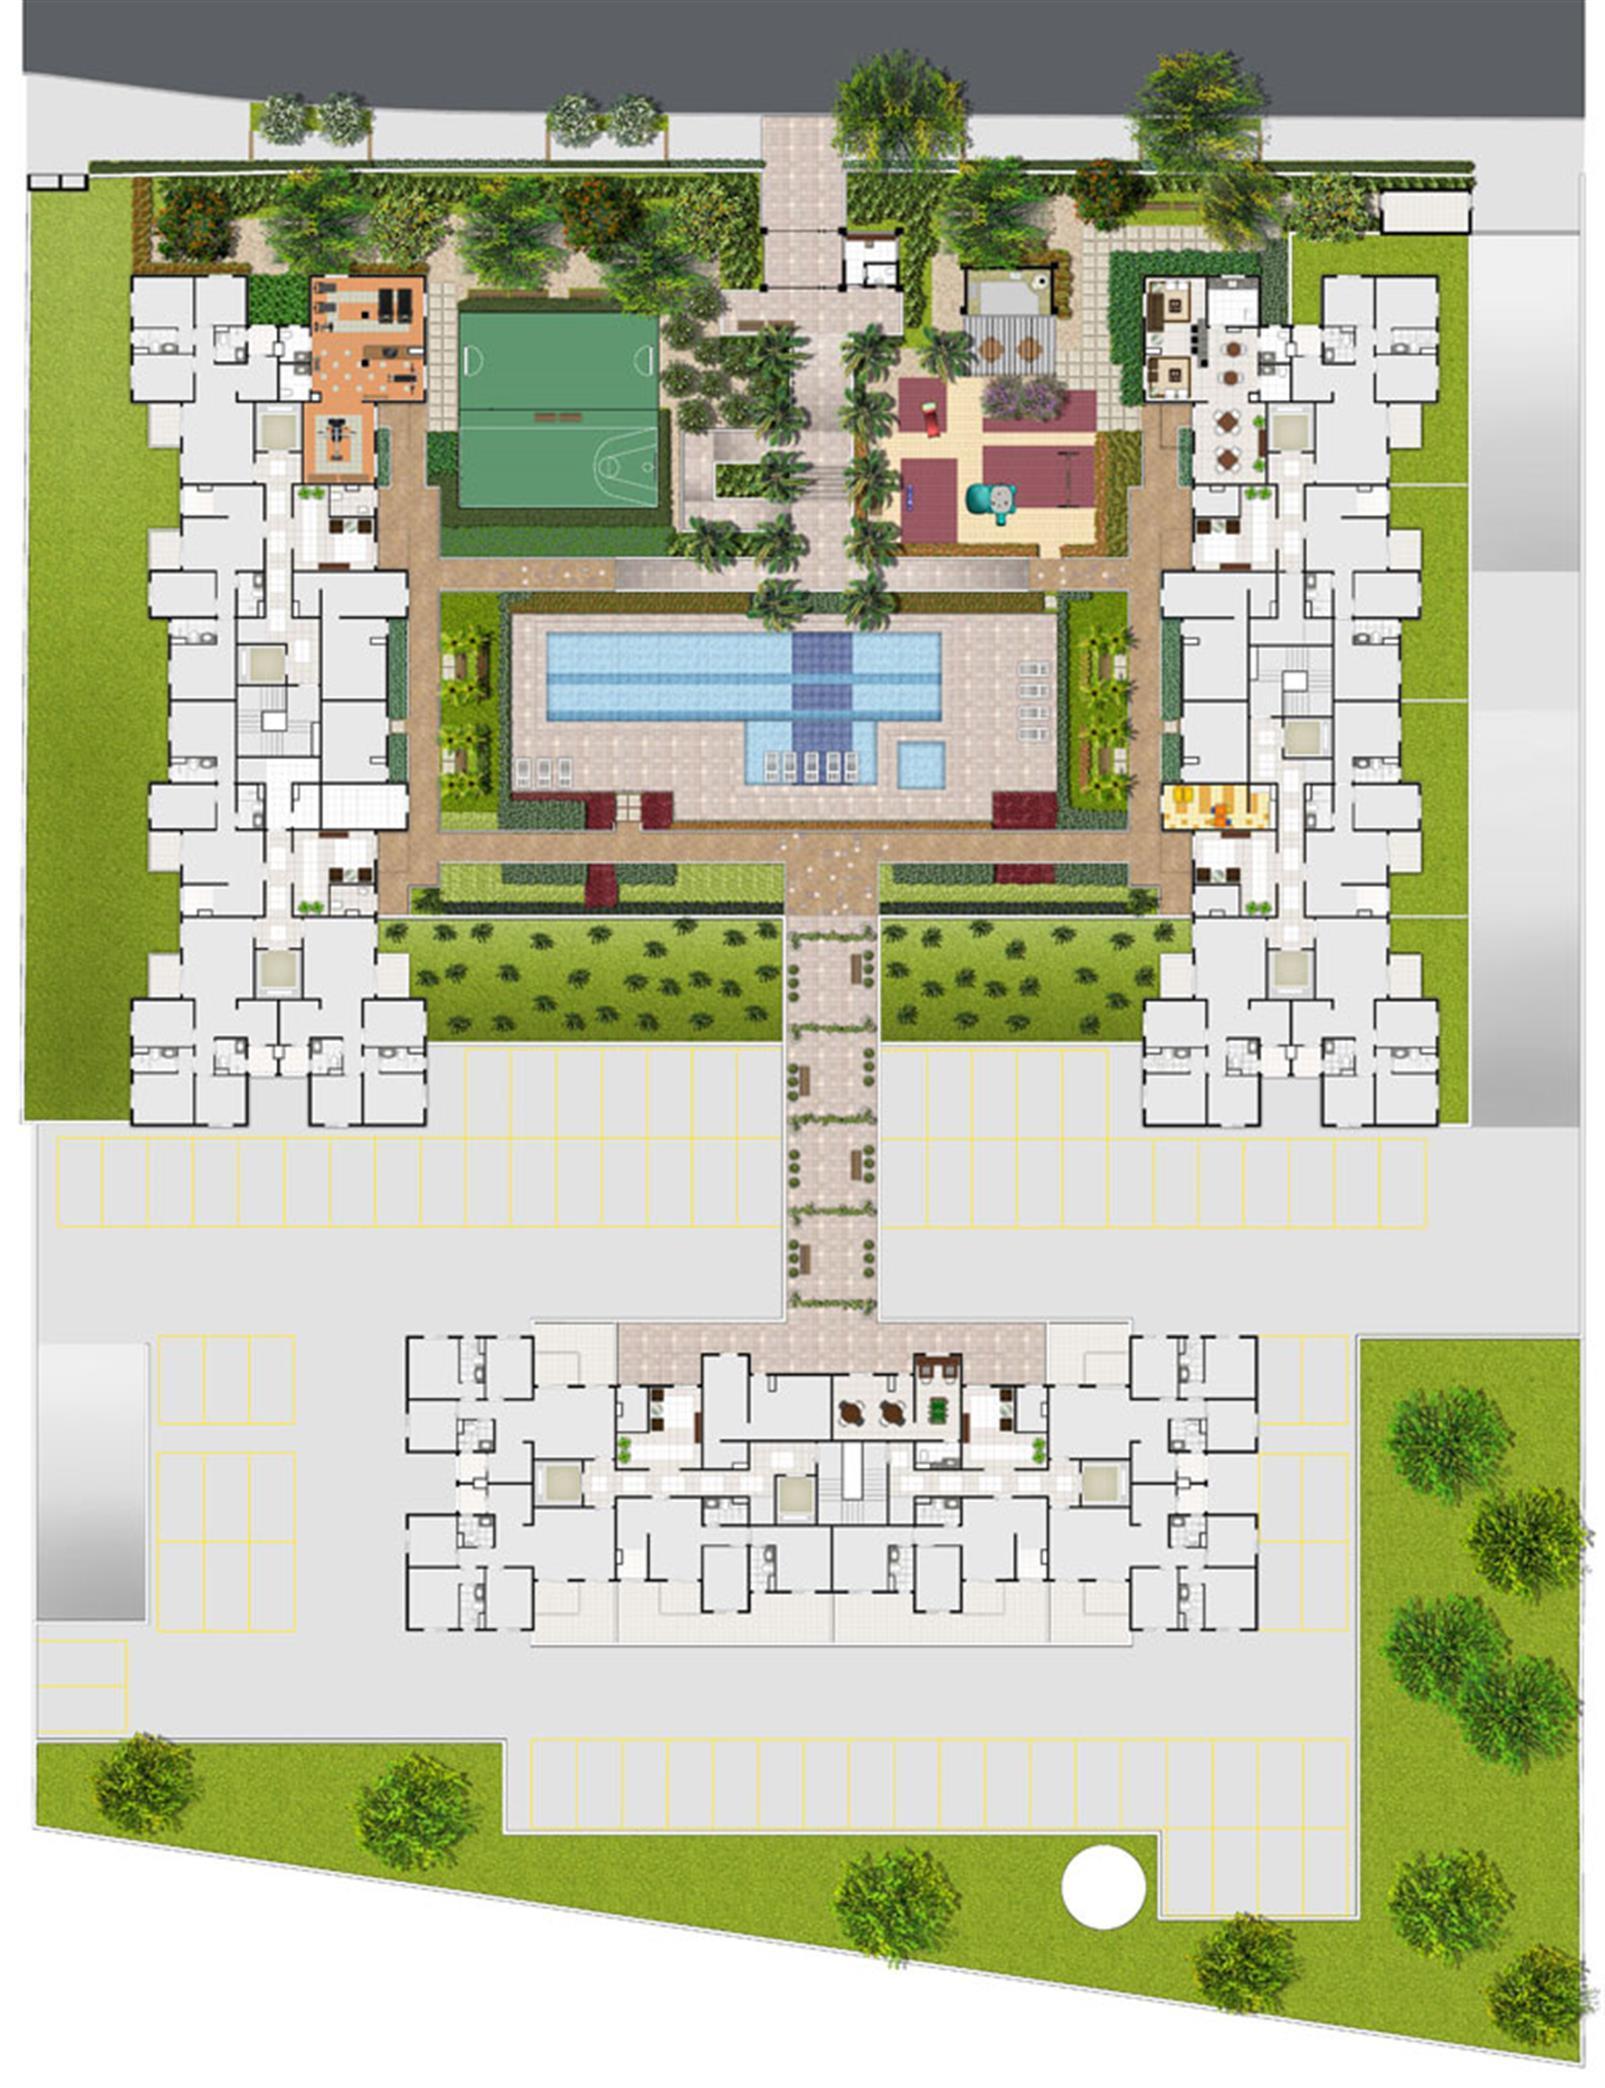 Planta:  | Fatto Club Diadema - Apartamento no Jardim Recanto - Diadema SP